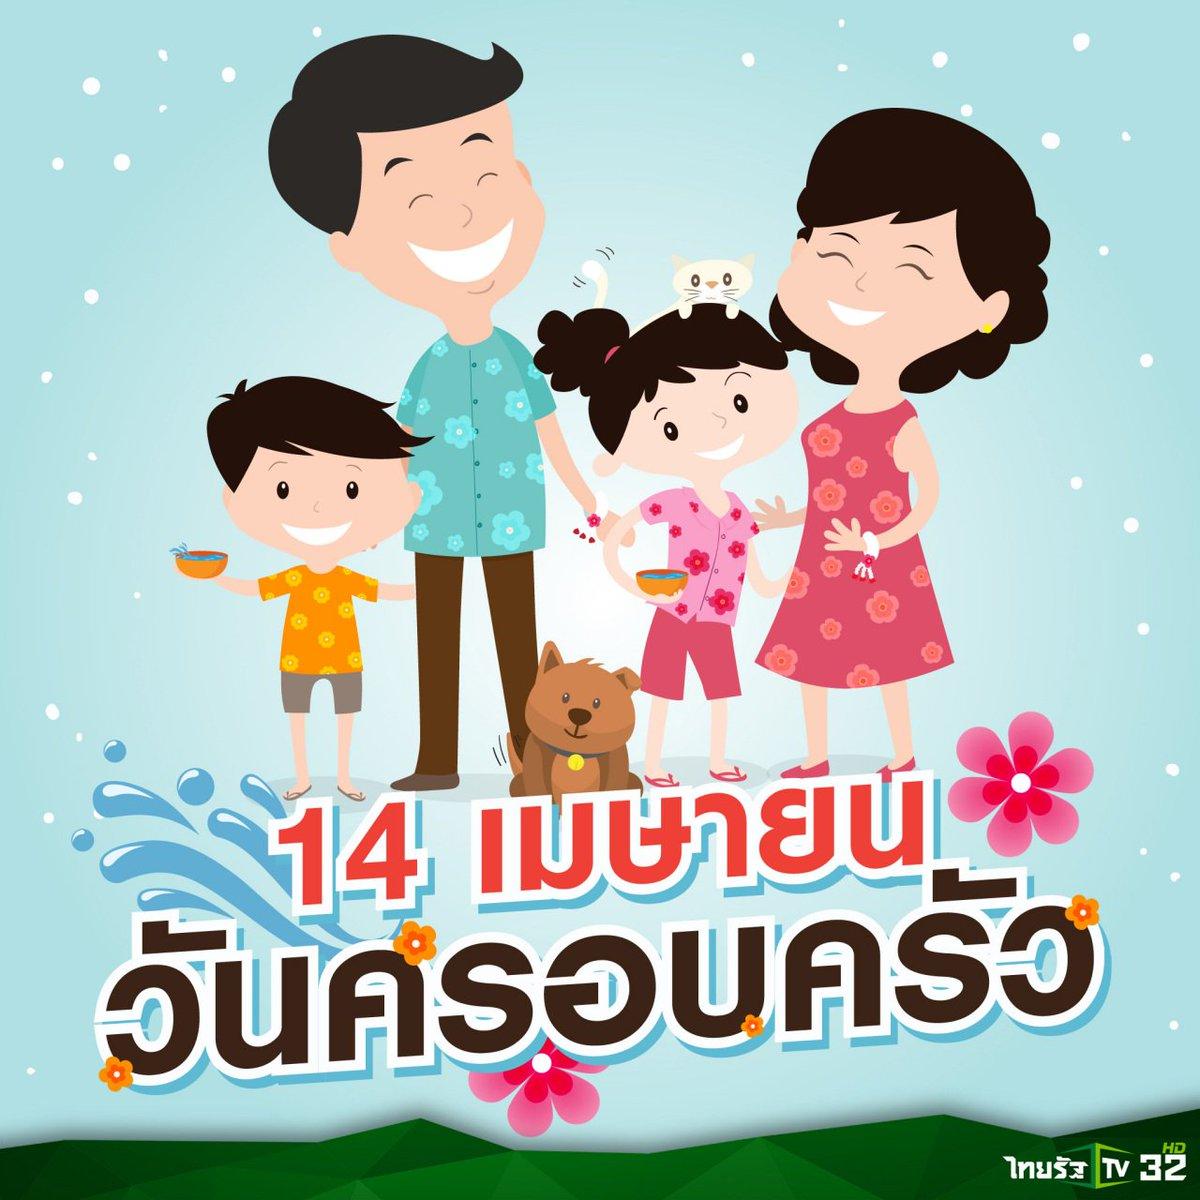 "Thairath_News on Twitter: ""14 เมษายนของทุกปี ตรงกับ #วันครอบครัว  <a href="